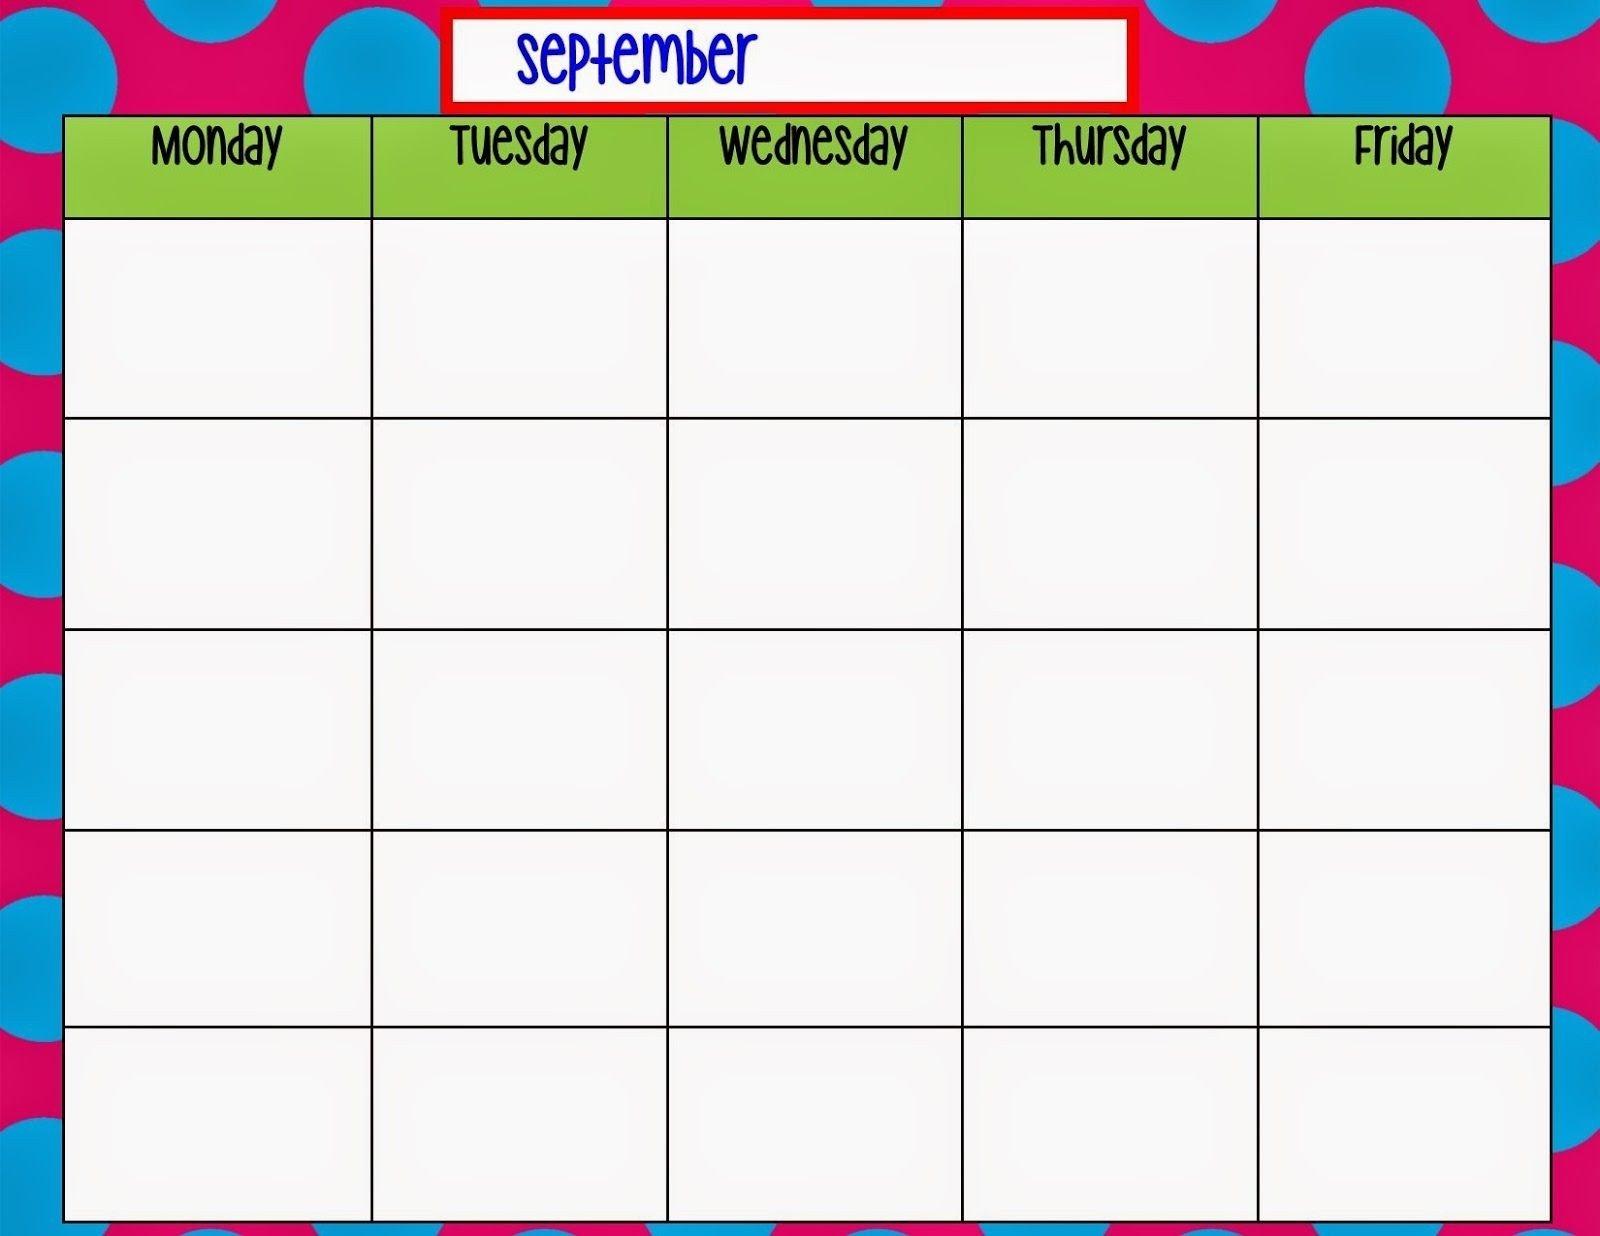 Monday To Friday Blank Calendar Printable   Calendar Printable Monday To Friday Timetable